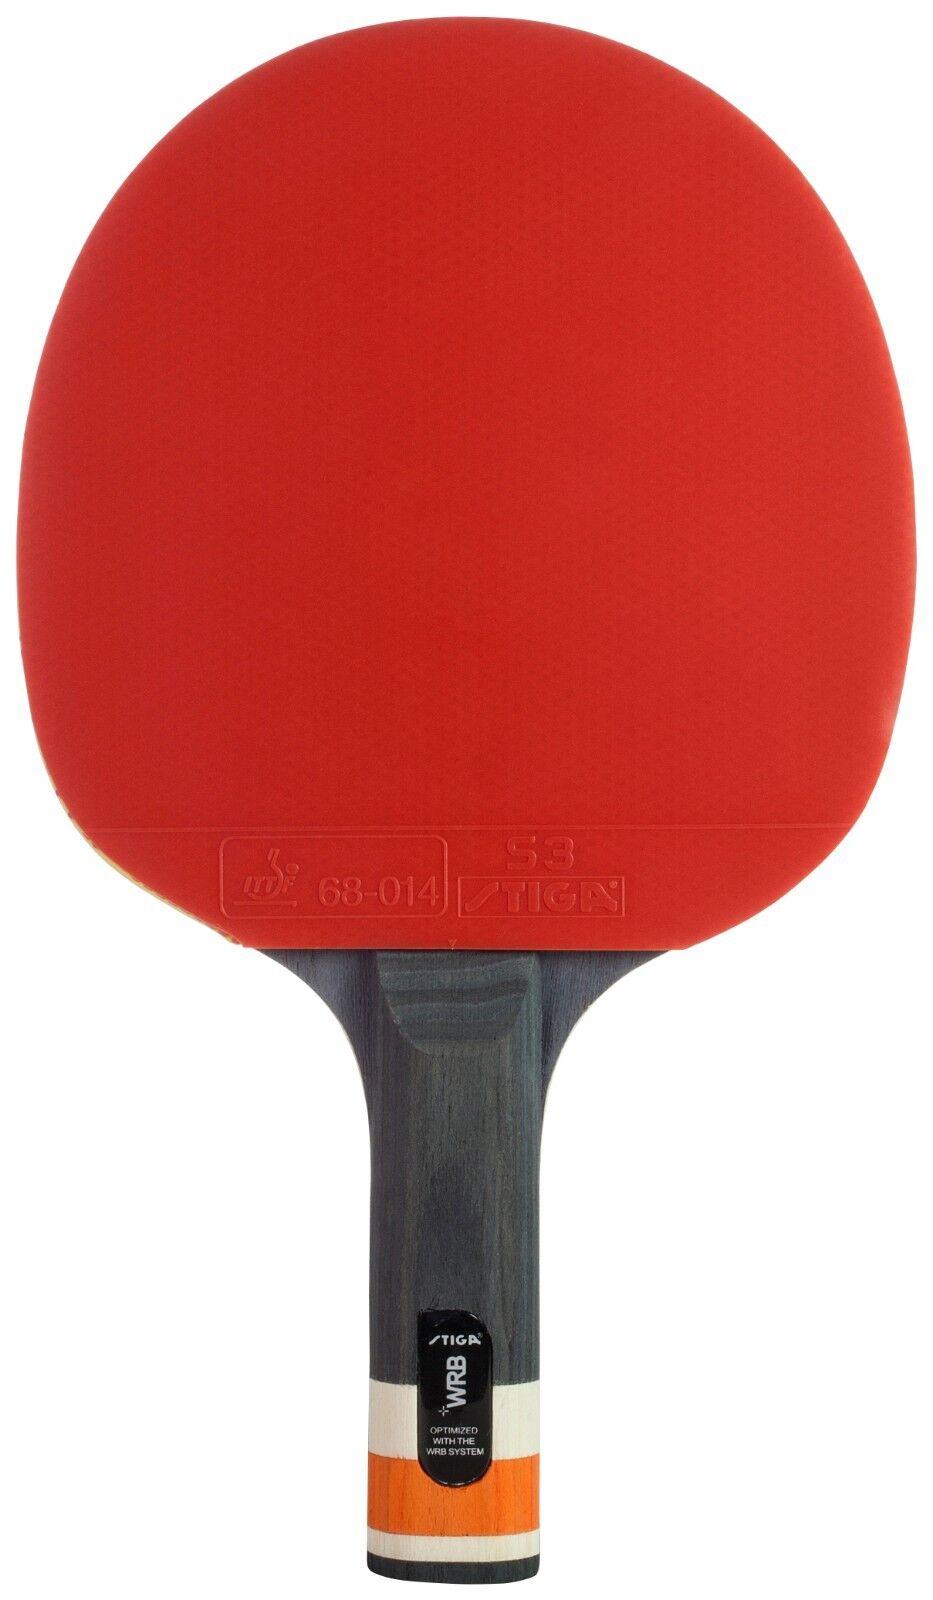 STIGA Table Tennis Racket Racket Racket Blade Straight Concave Indoor 4cbbfa